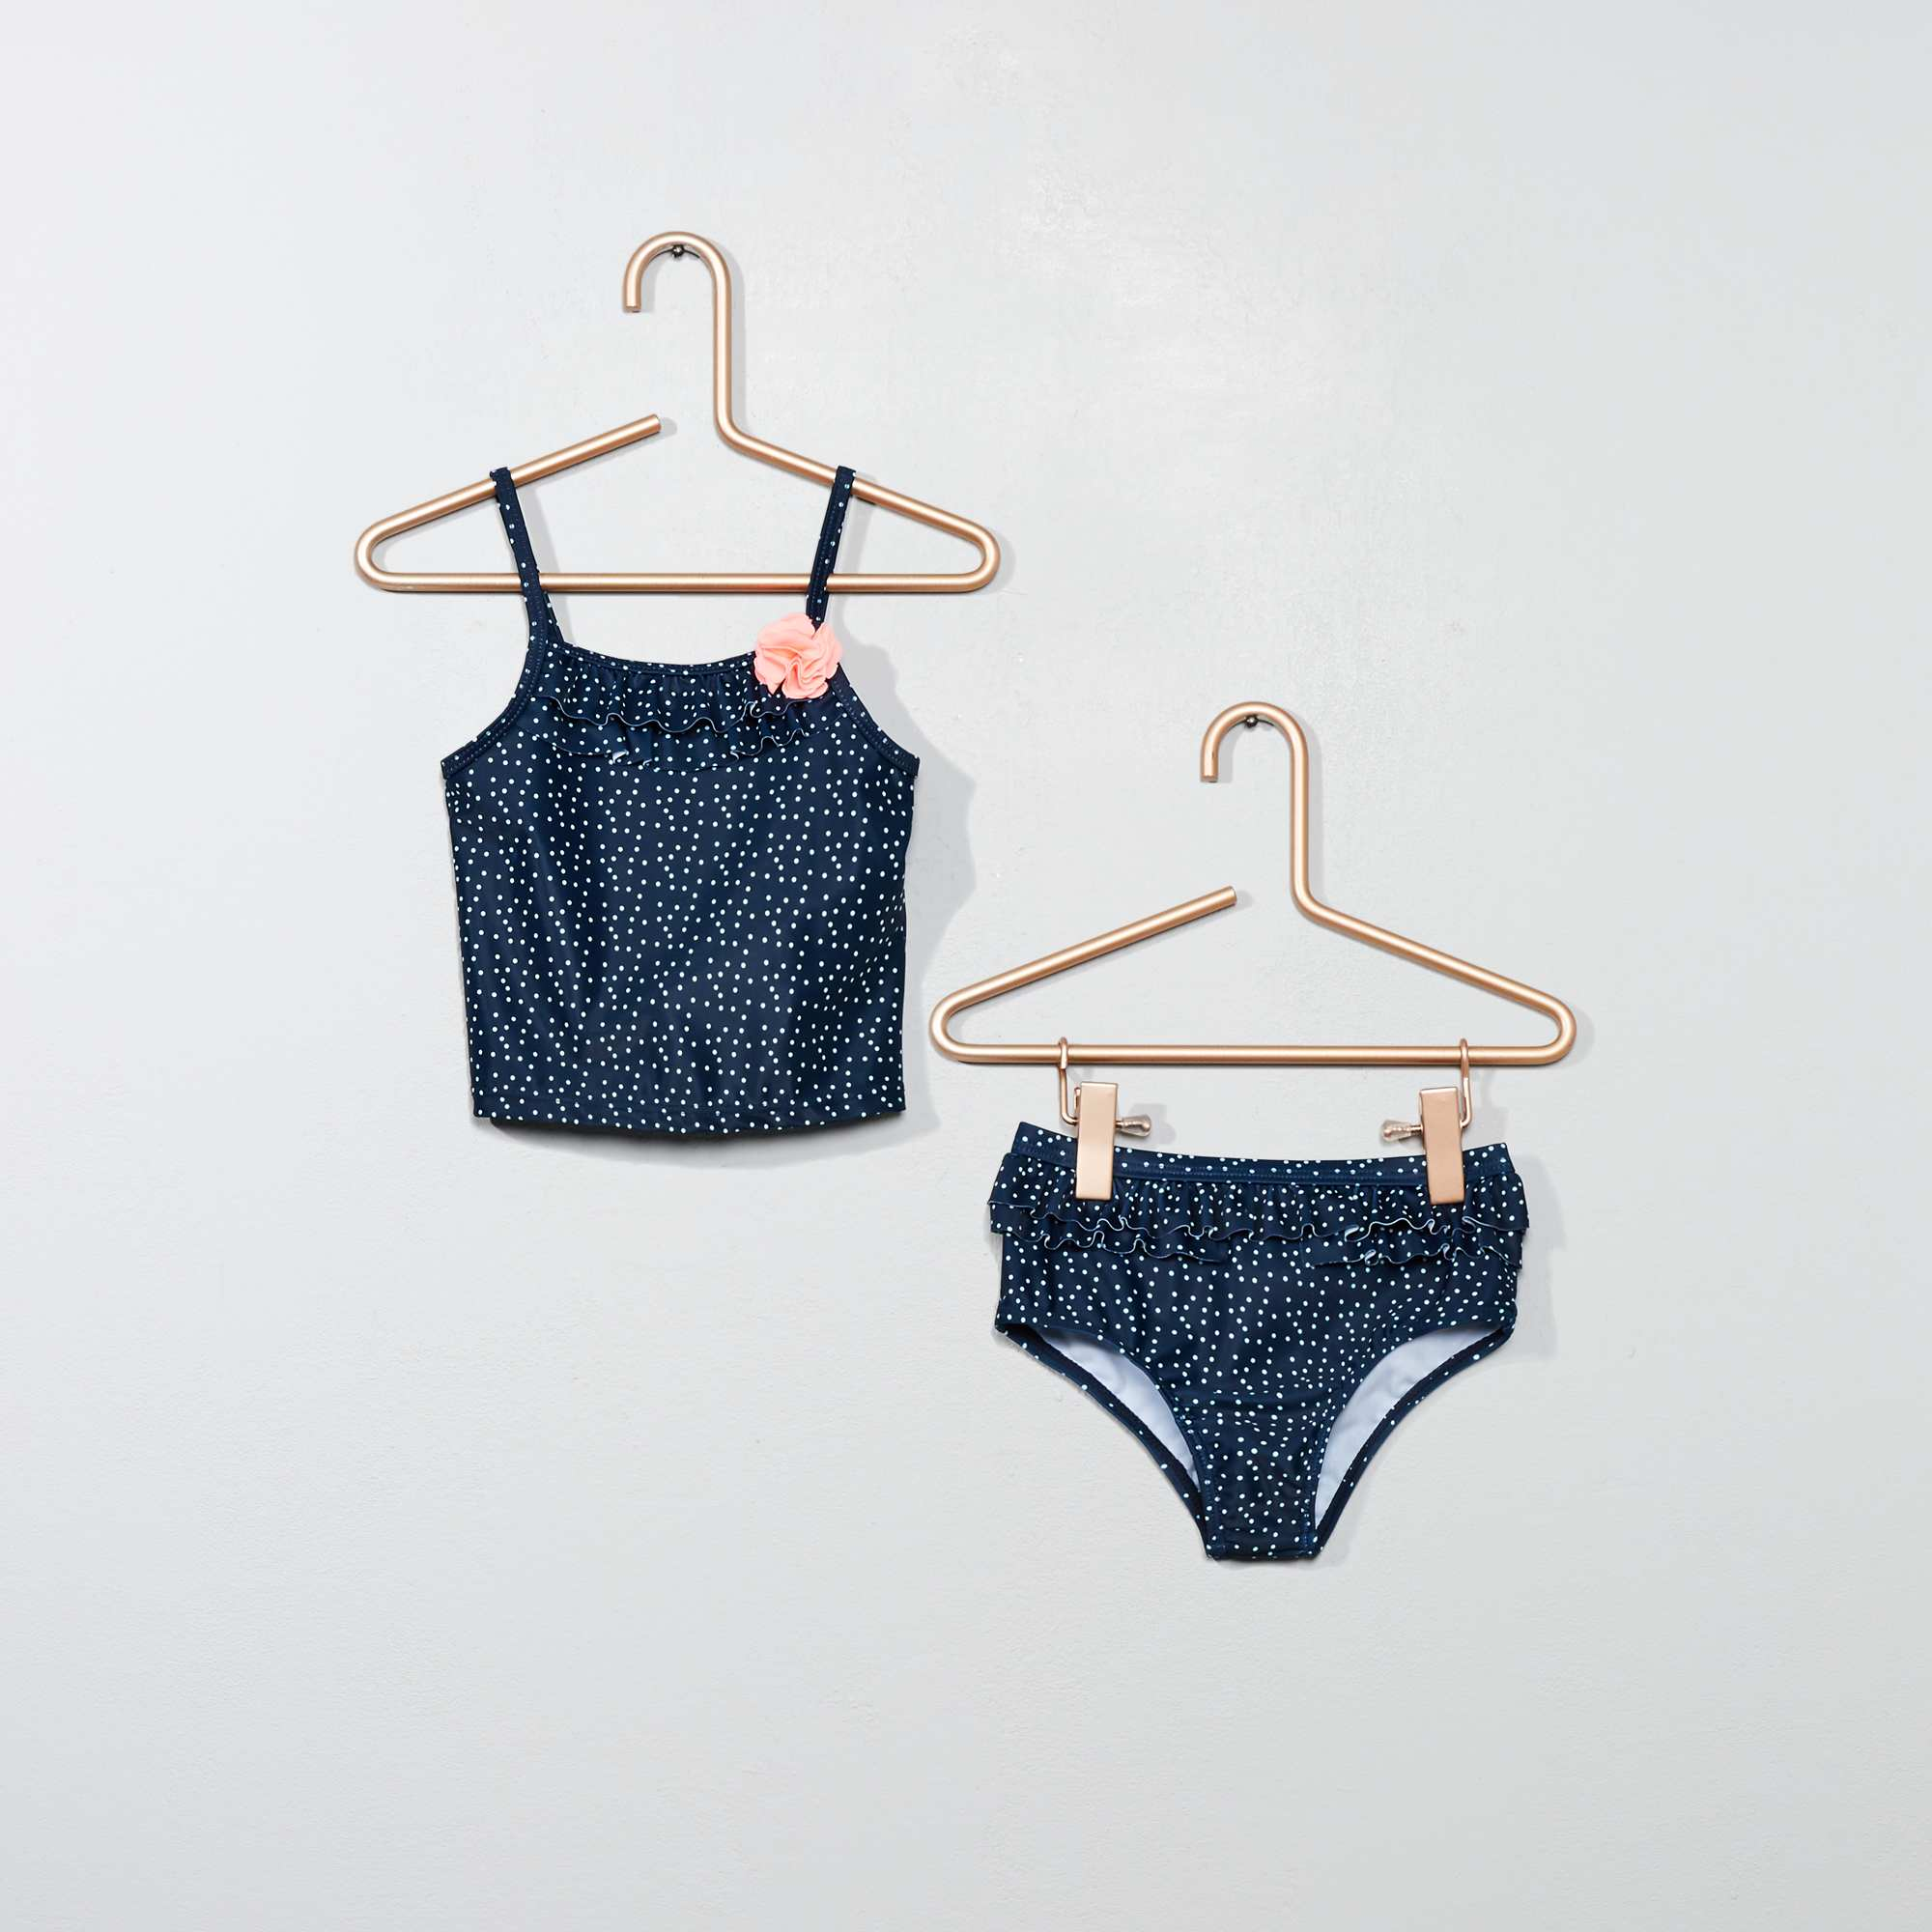 maillot de bain 2 pi ces tankini b b fille bleu marine. Black Bedroom Furniture Sets. Home Design Ideas